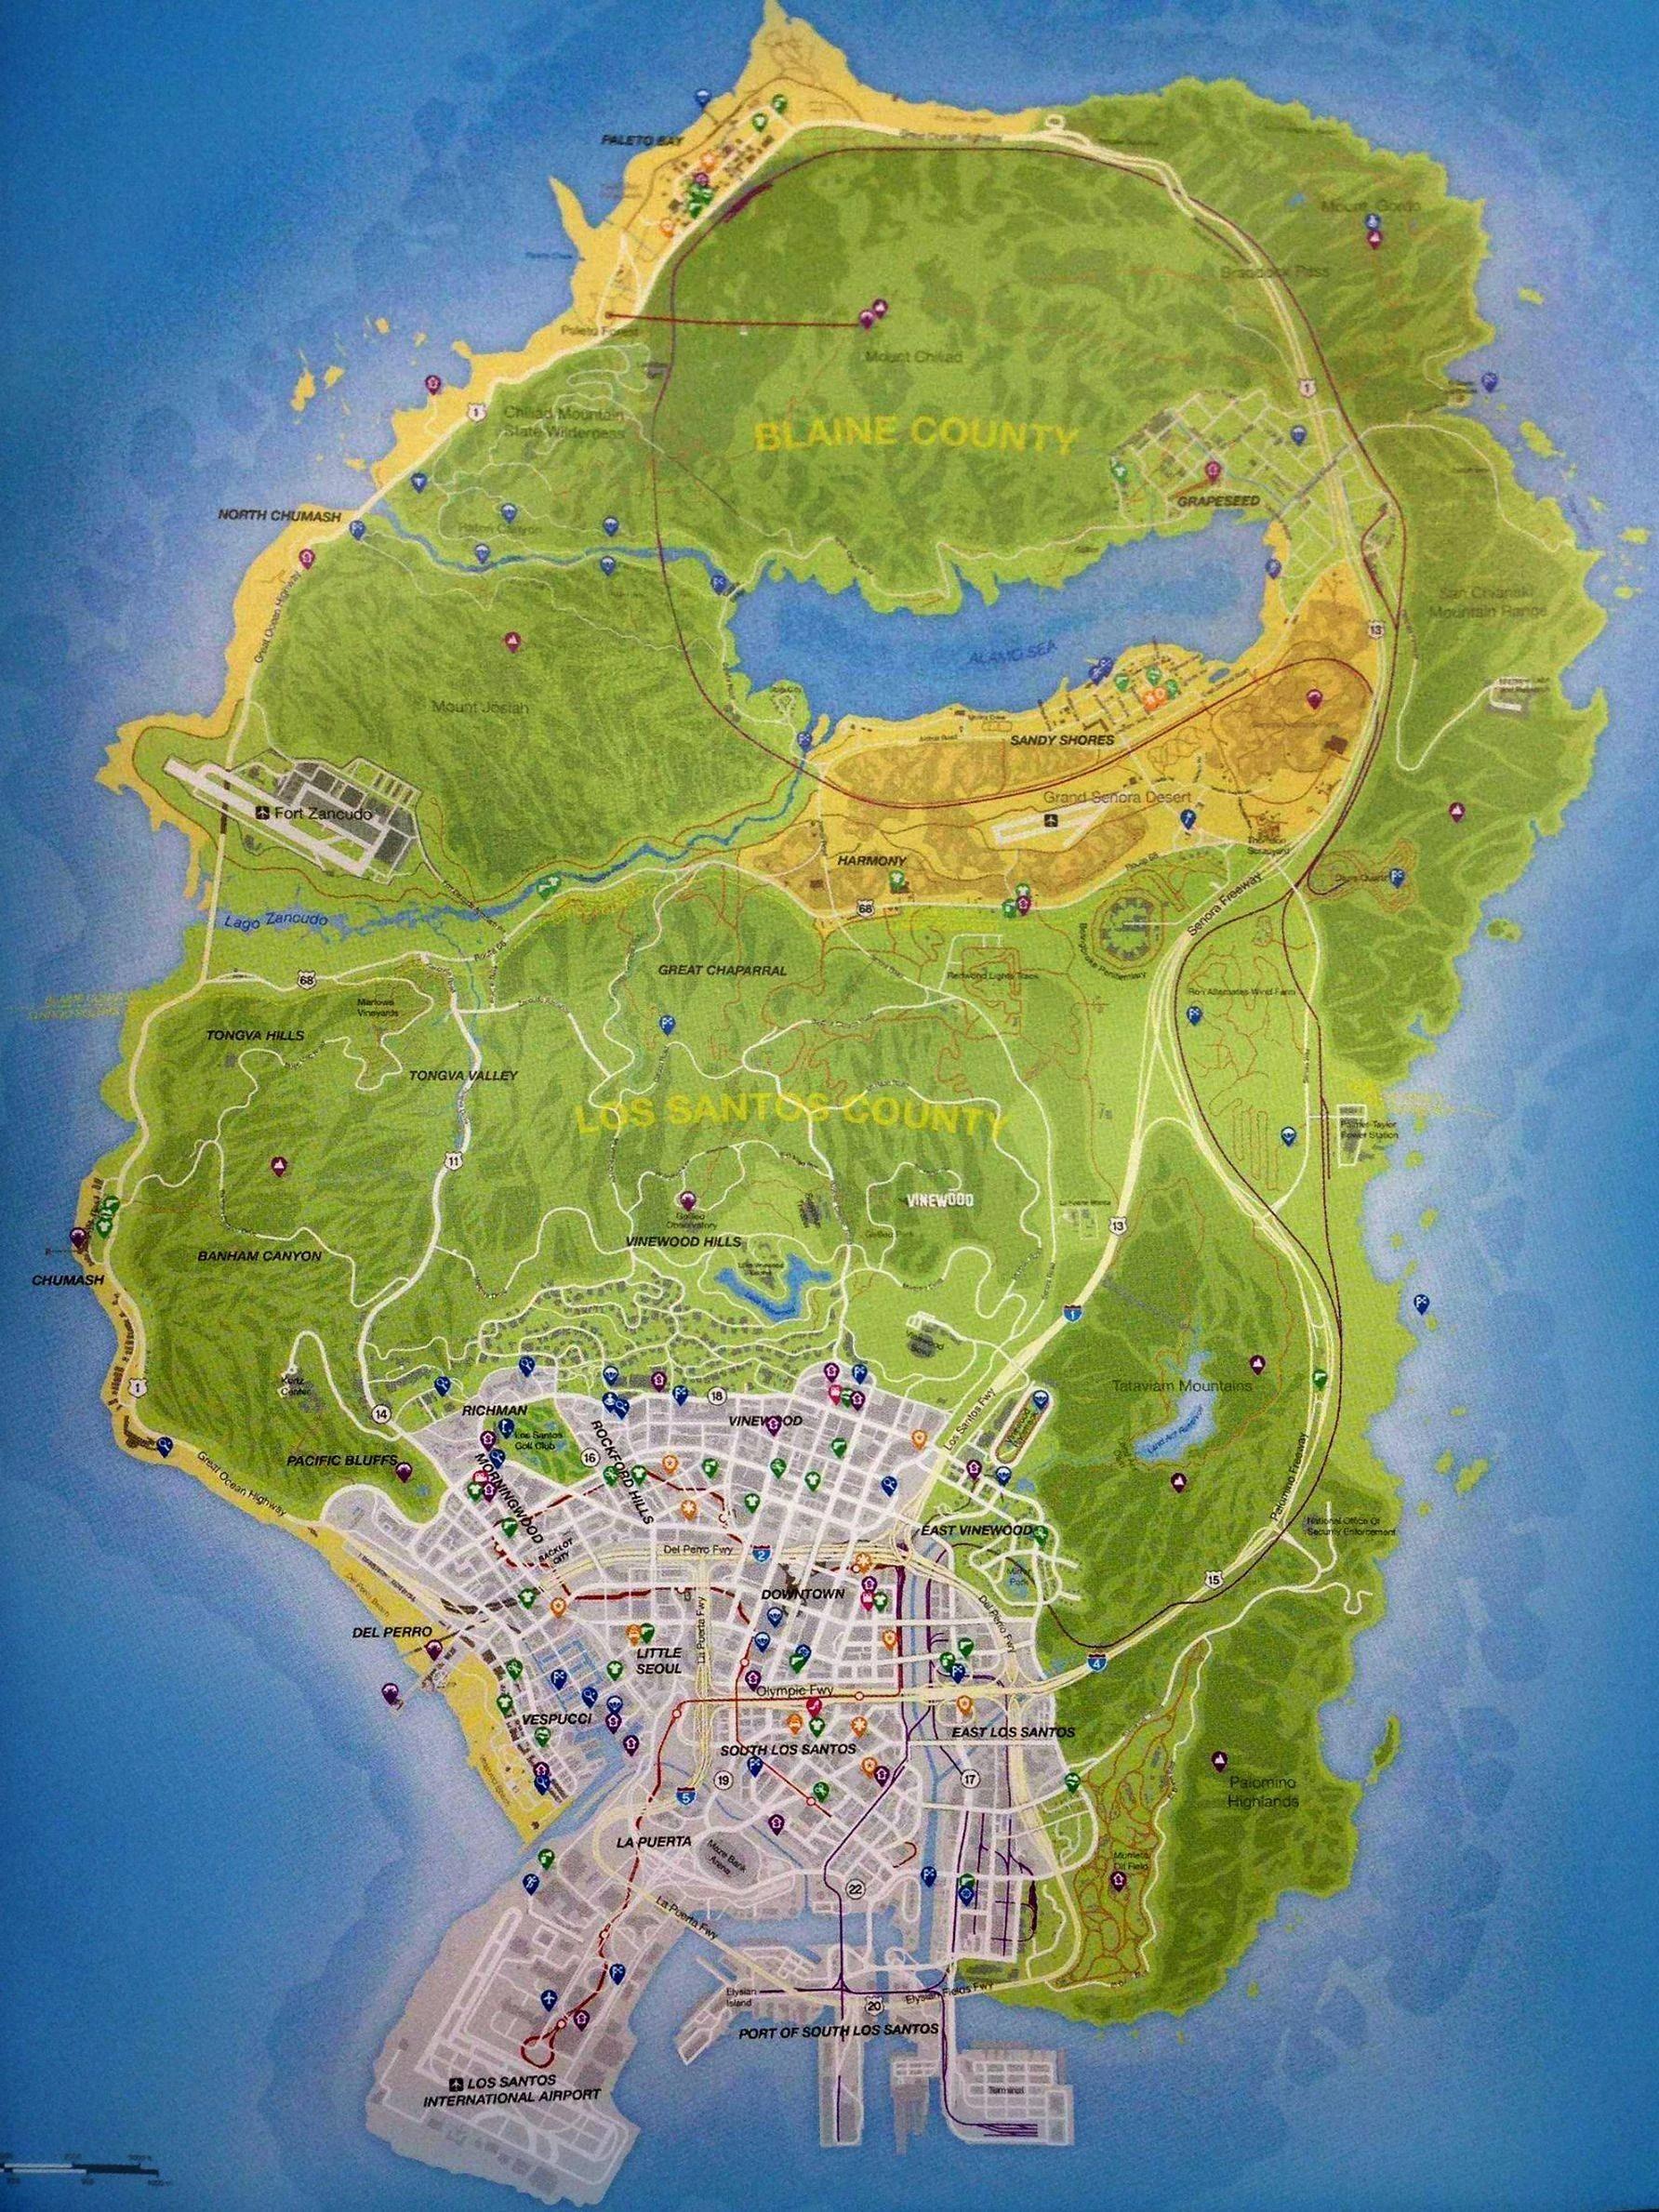 Gta 5 Rare Car Locations Map Offline : locations, offline, Myths, Legends, Fandom